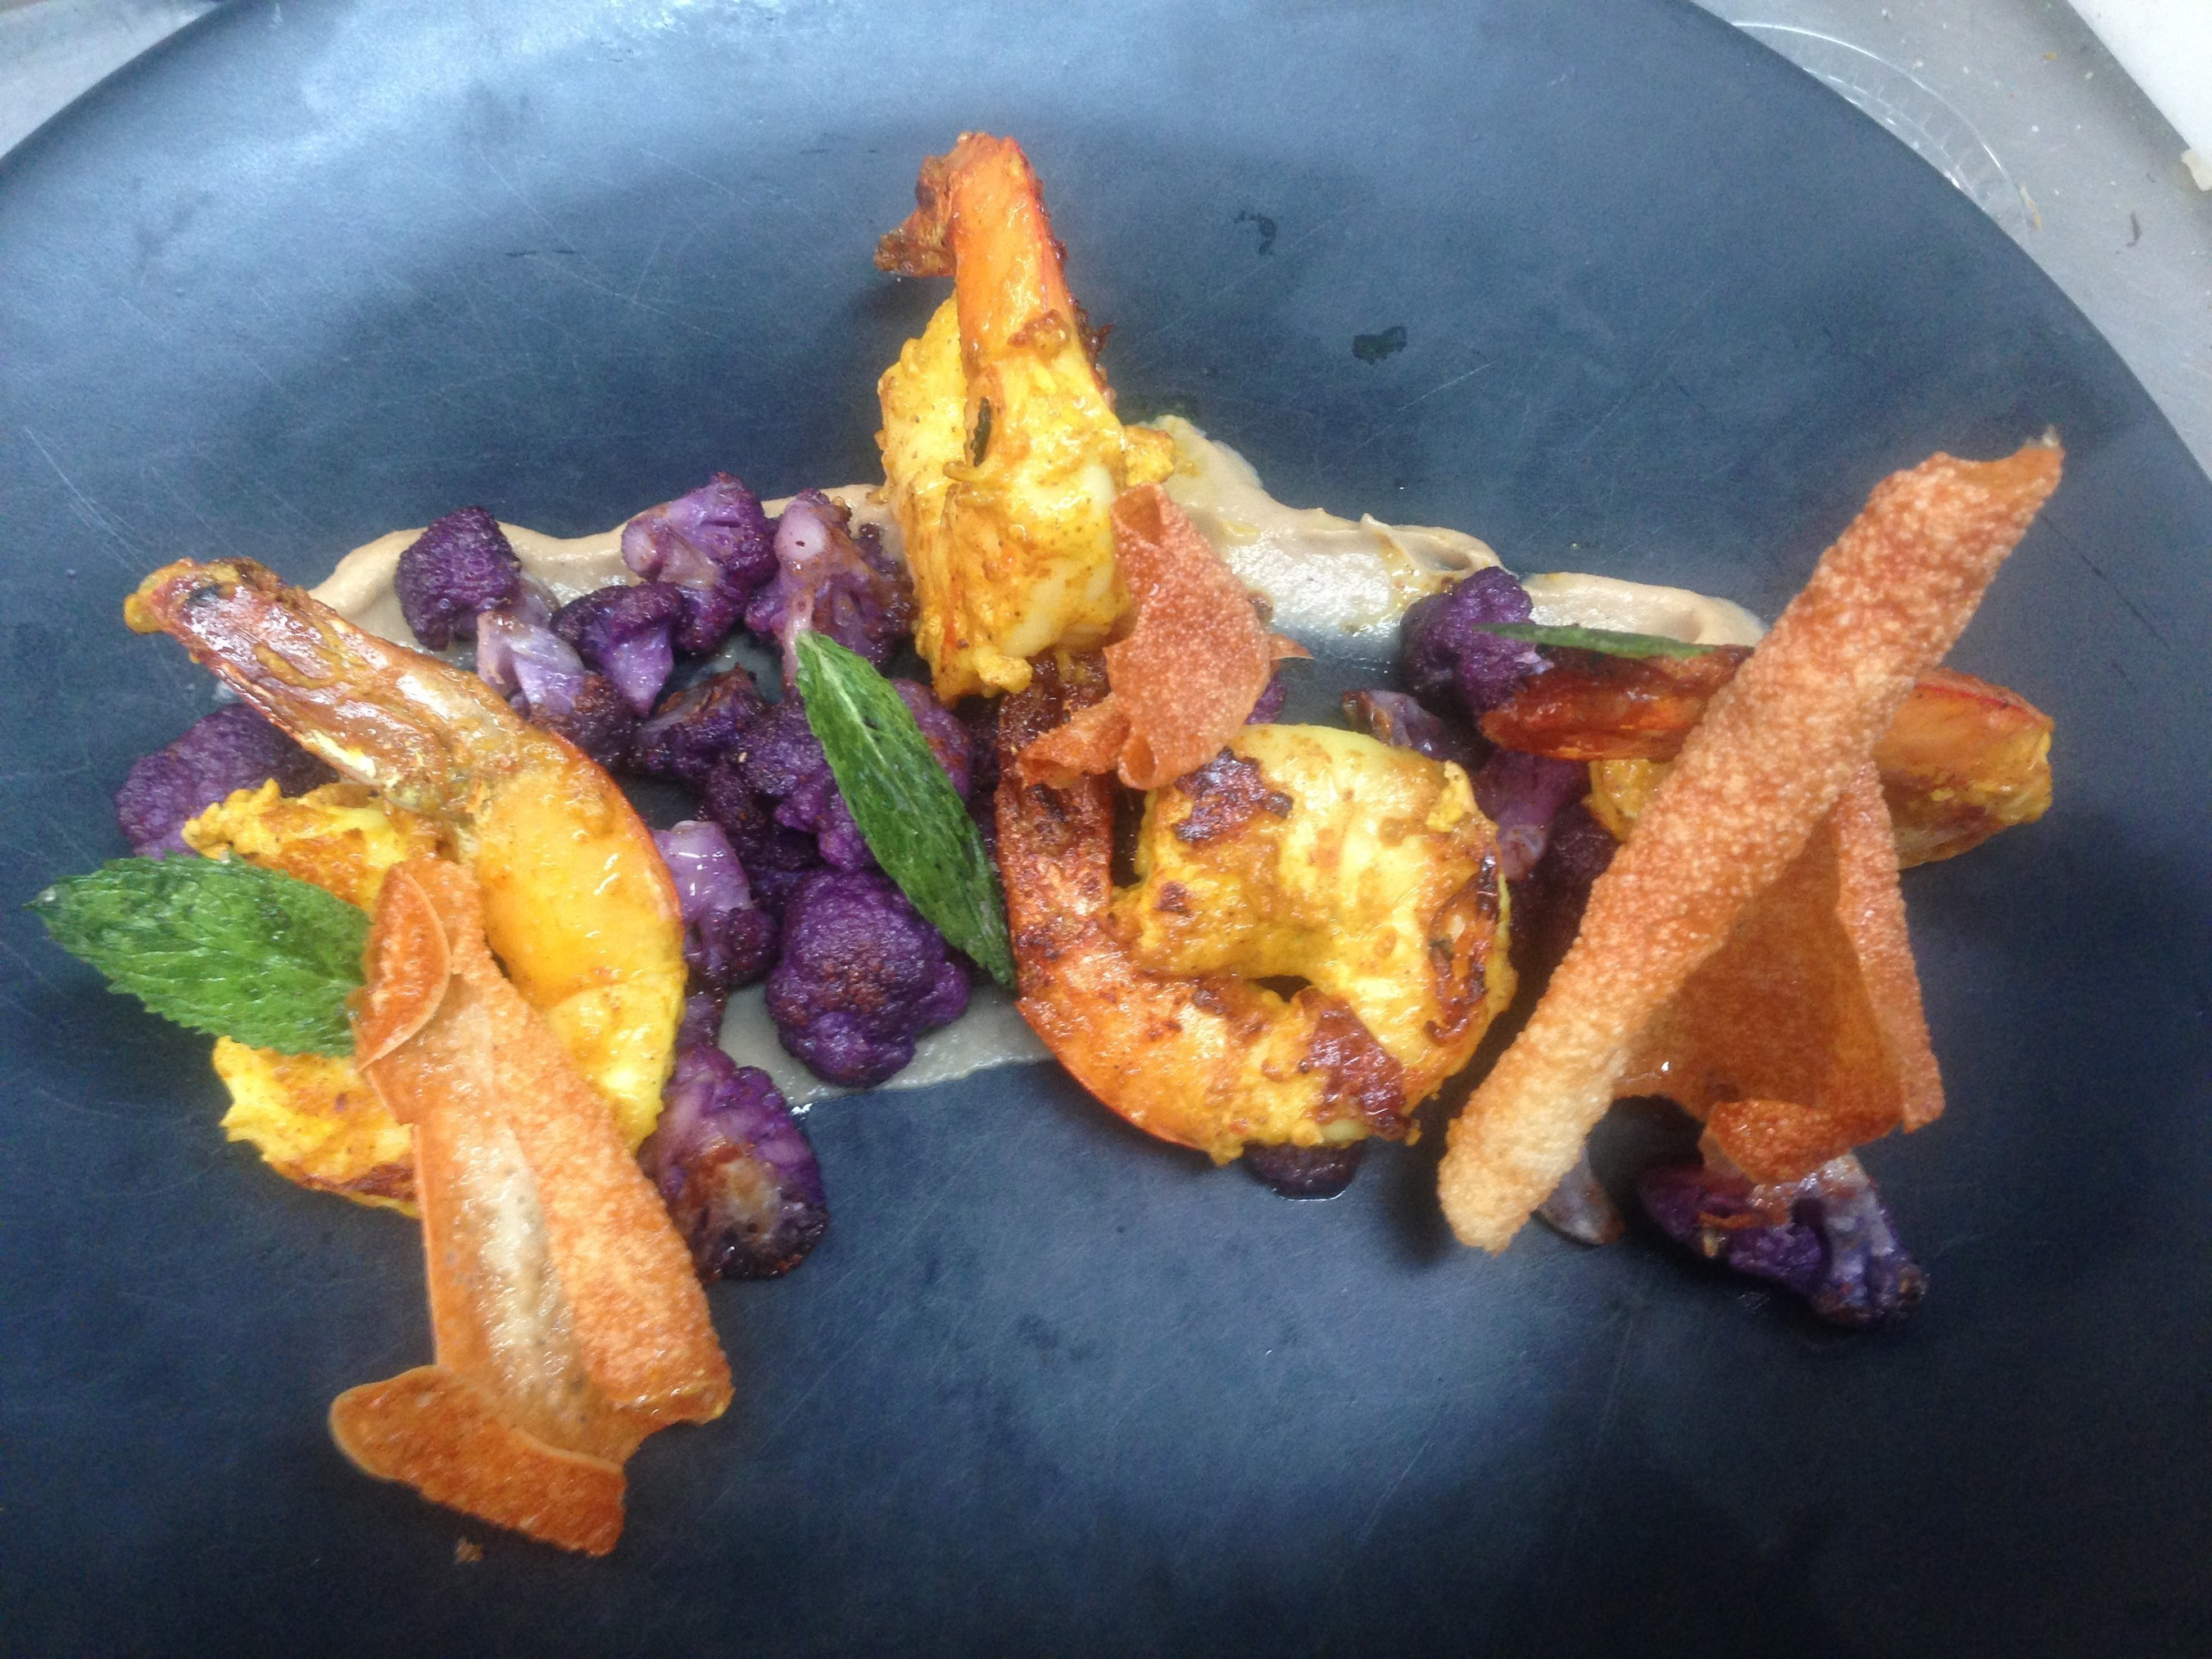 Popular Park Slope Restaurant Carnem Prime Steakhouse Announces new Chef Tadateru Tokudaiji on a